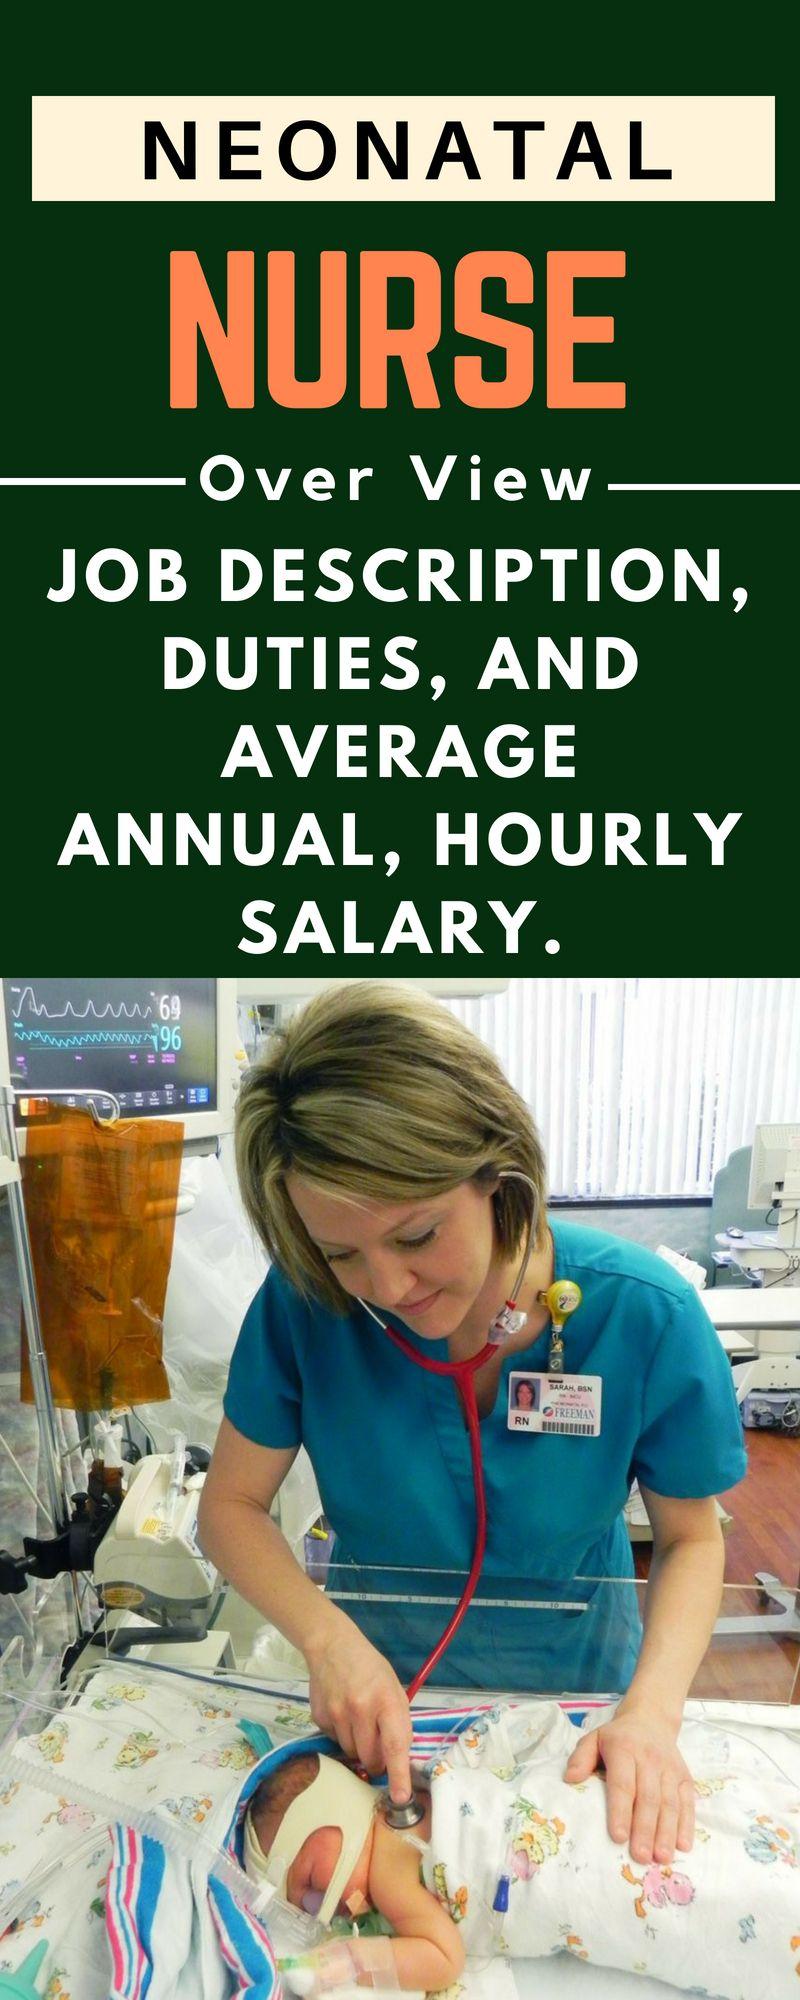 Neonatal Nurse Practitioner Salary, Job Description and